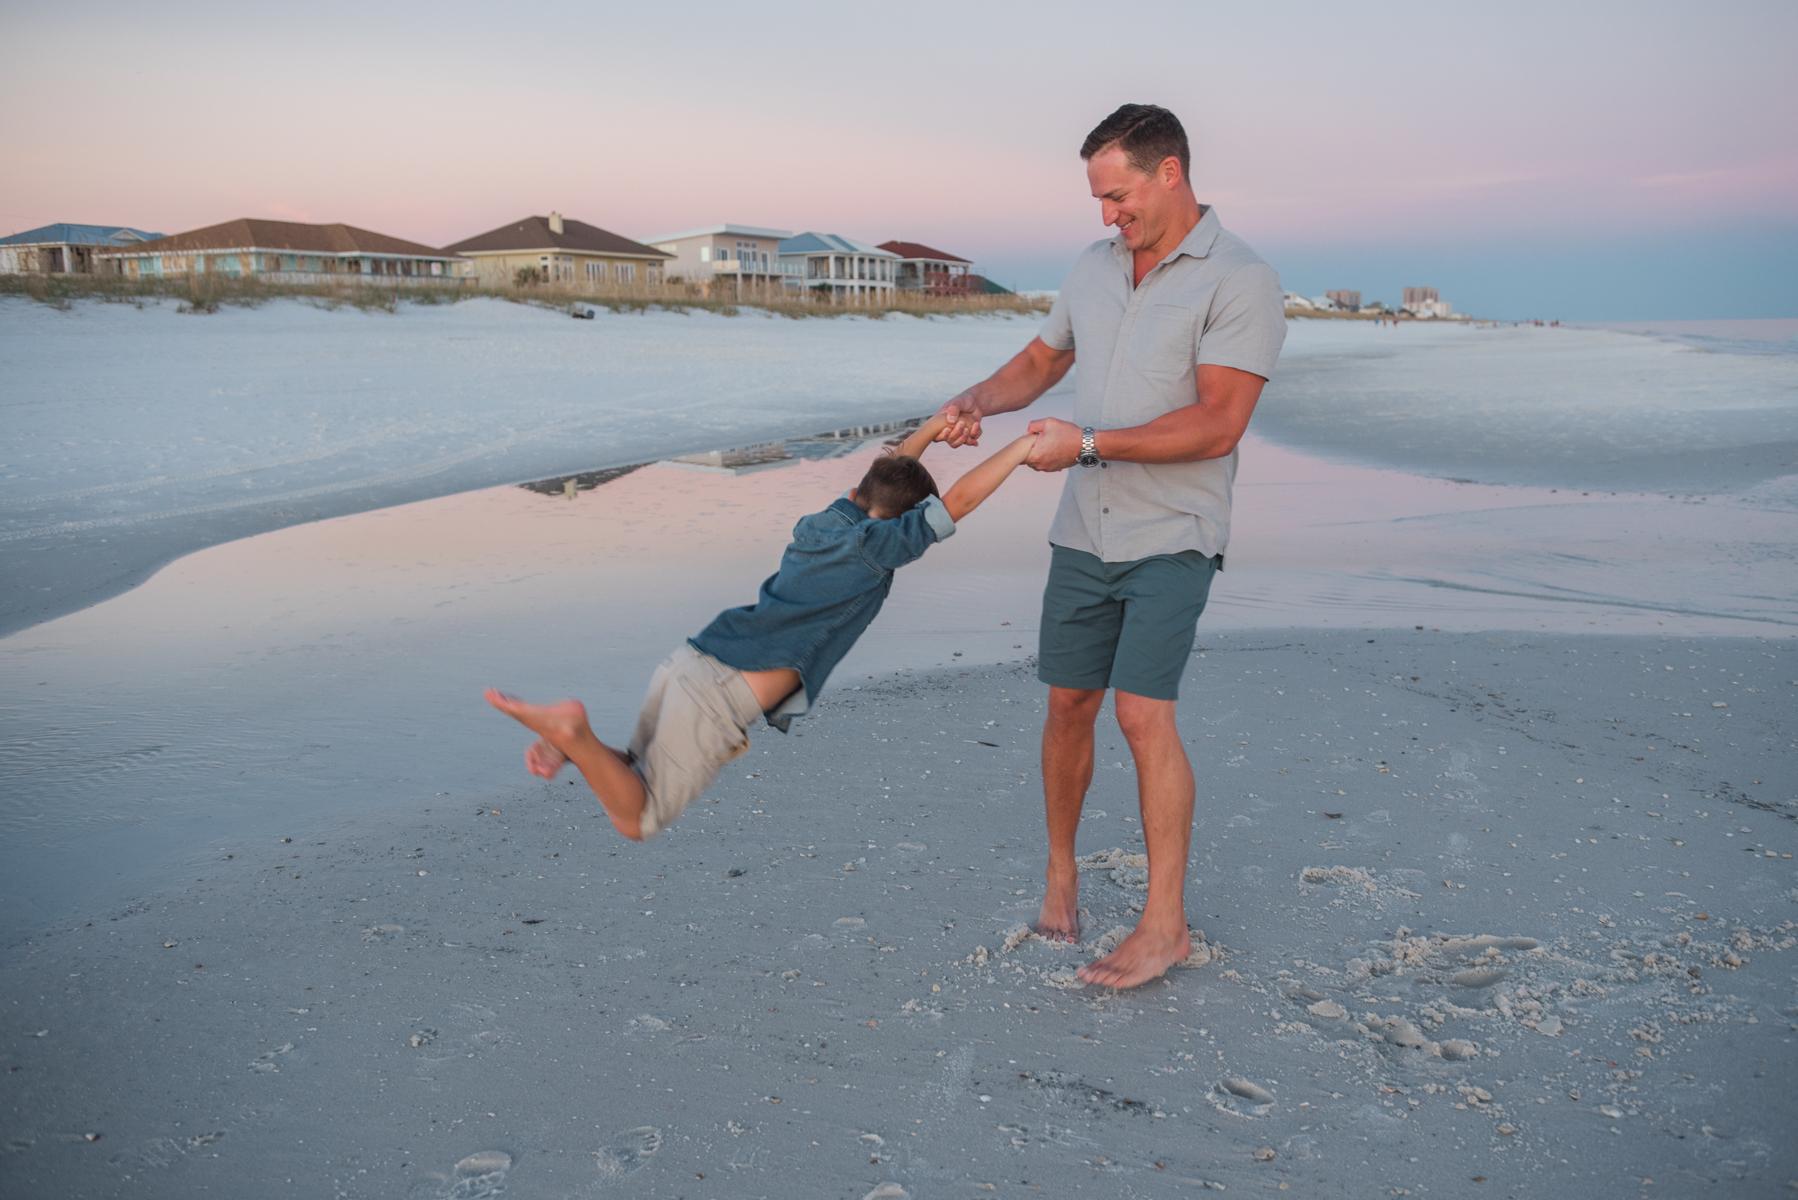 dad swinging son at beach-pensacola family photographer